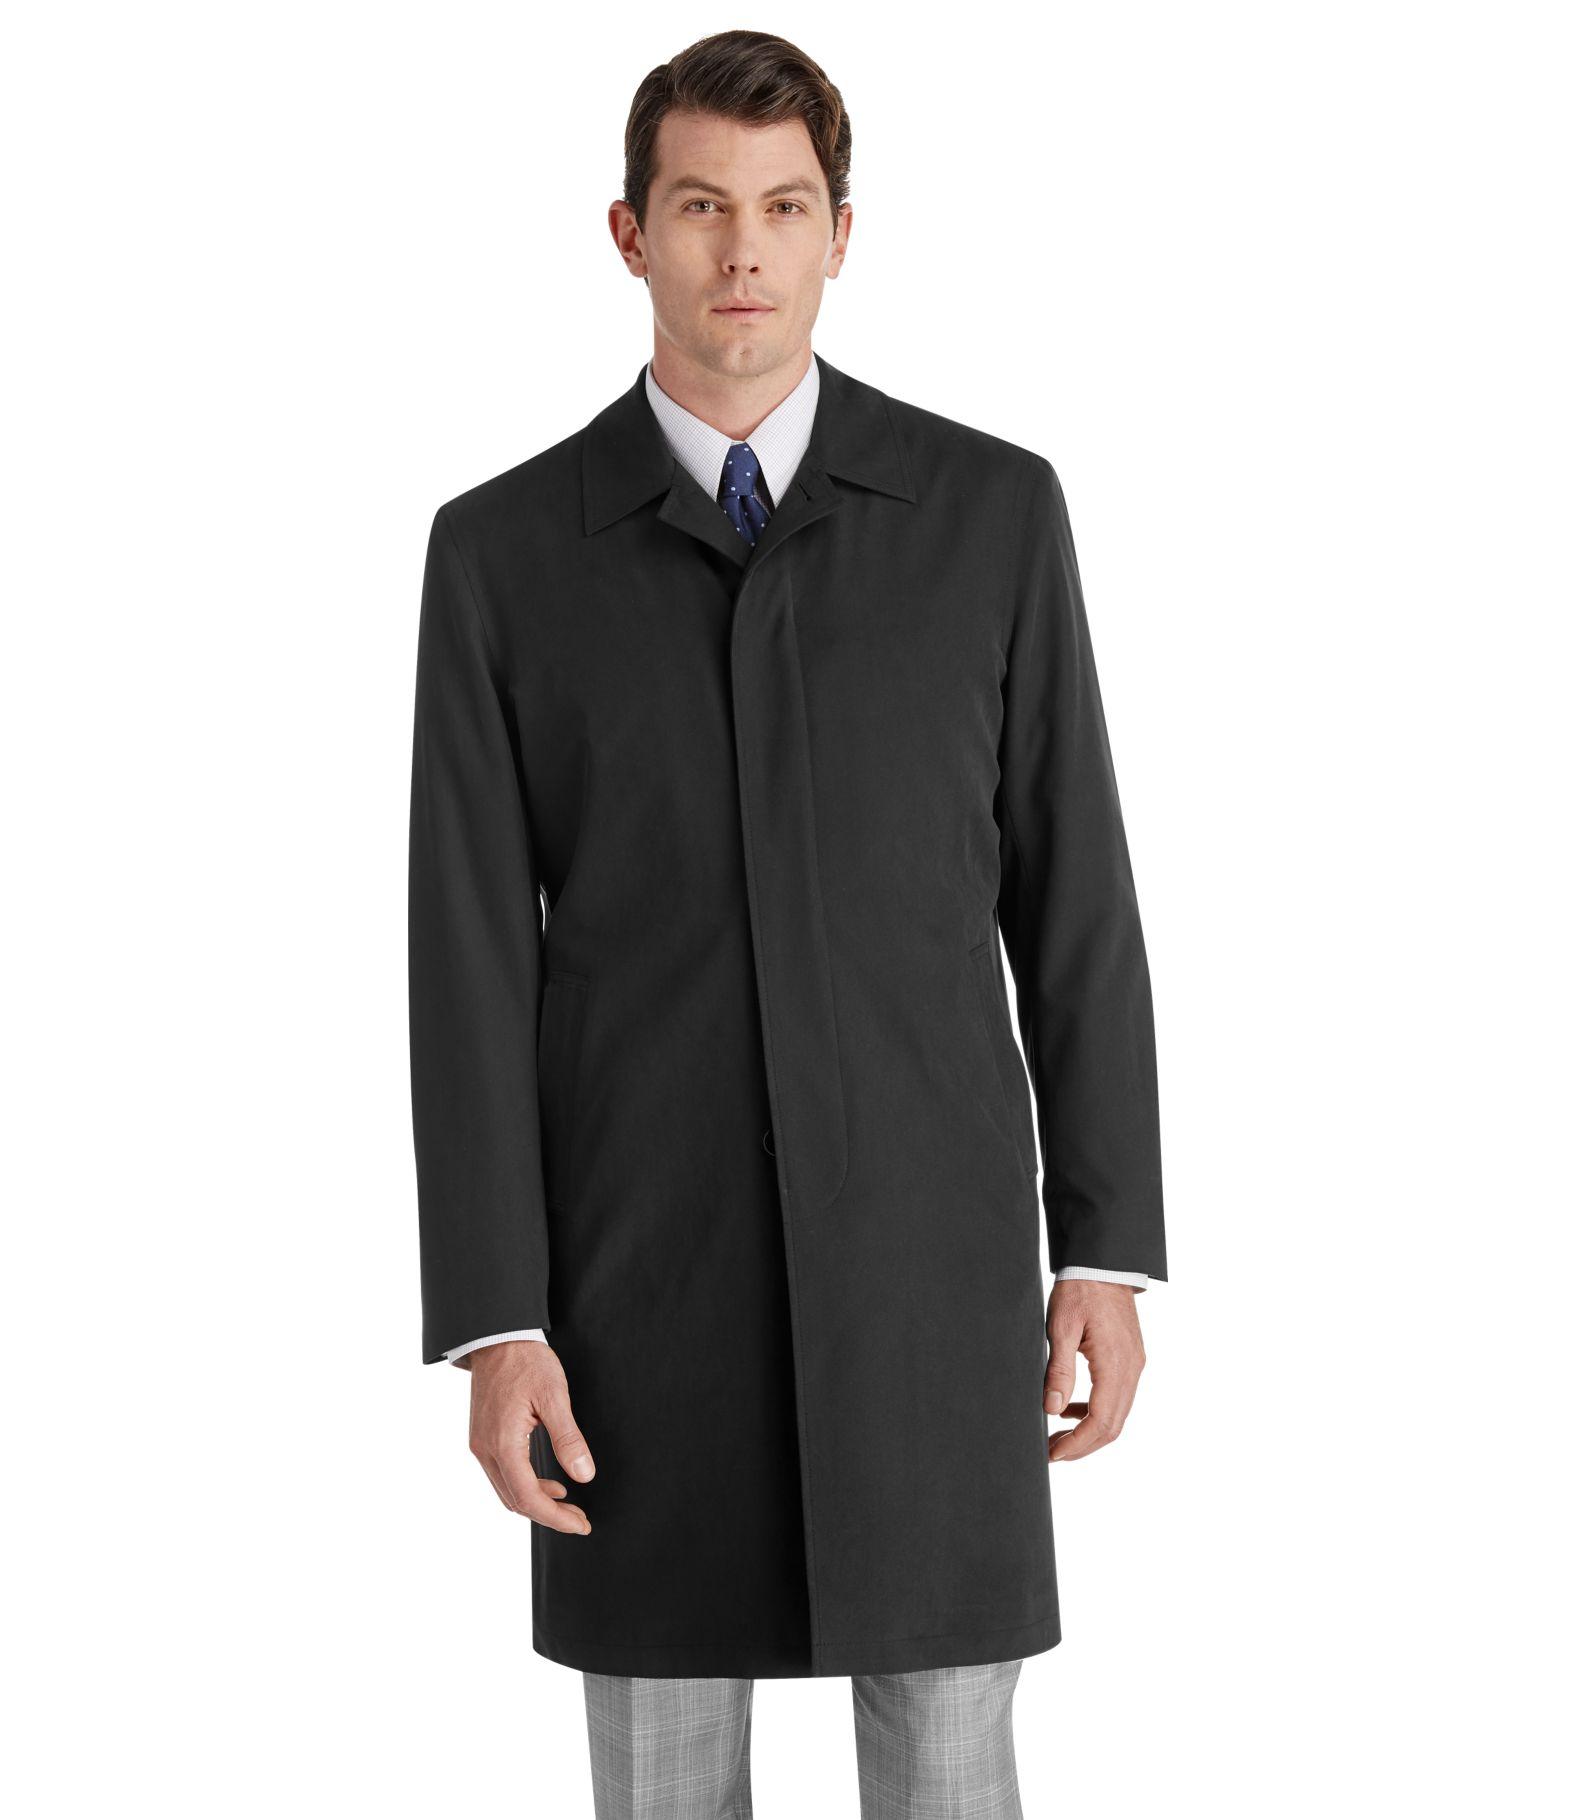 Men's Raincoats & Trenchcoats | Men's Outerwear | JoS. A. Bank ...